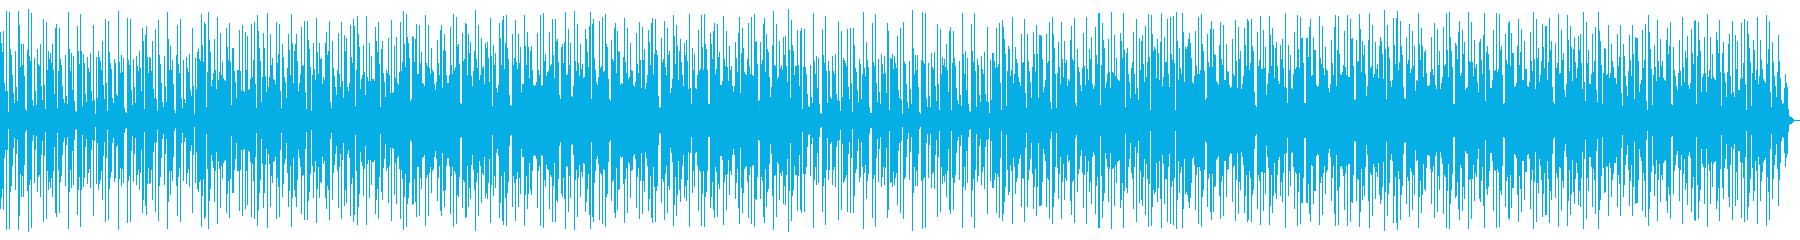 Digital. graphic. Techno_3's reproduced waveform